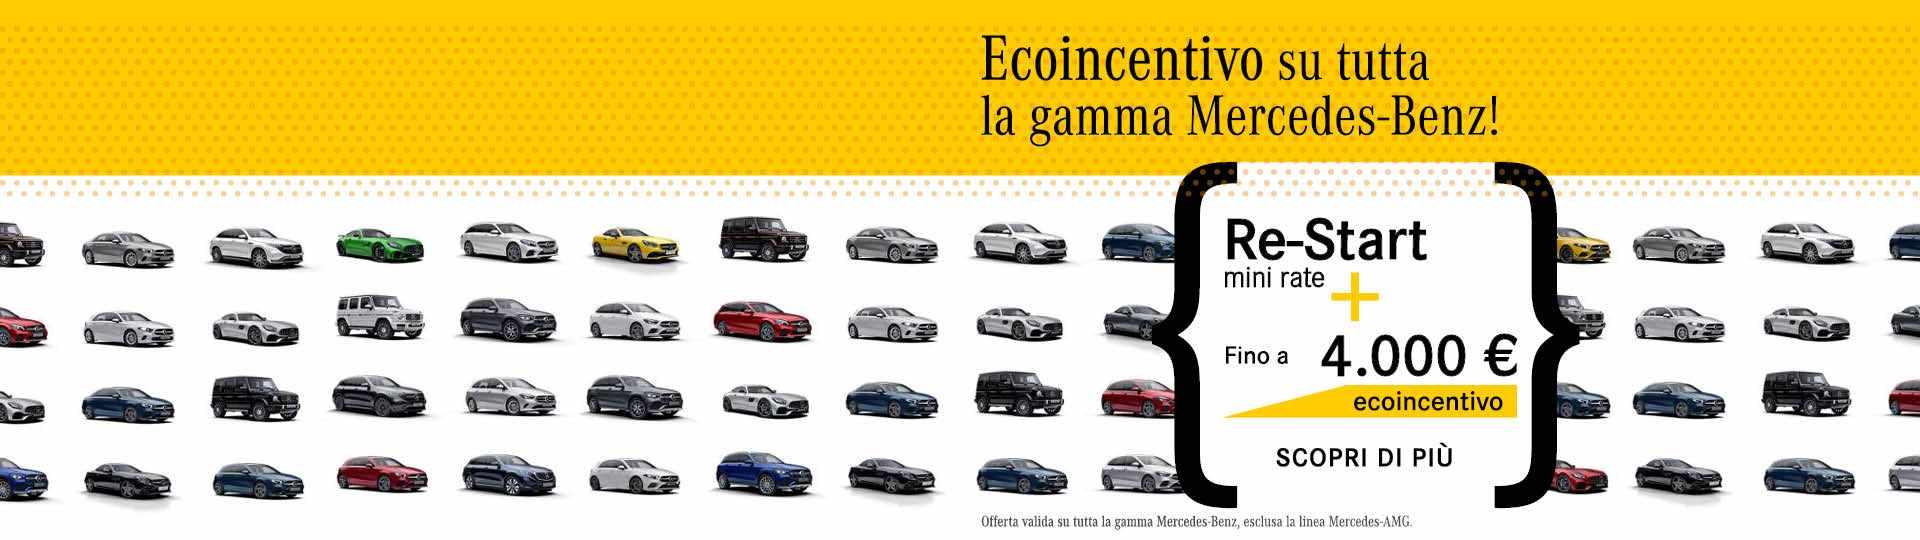 Ecoincentivo MB_aprile 2020_2.jpg